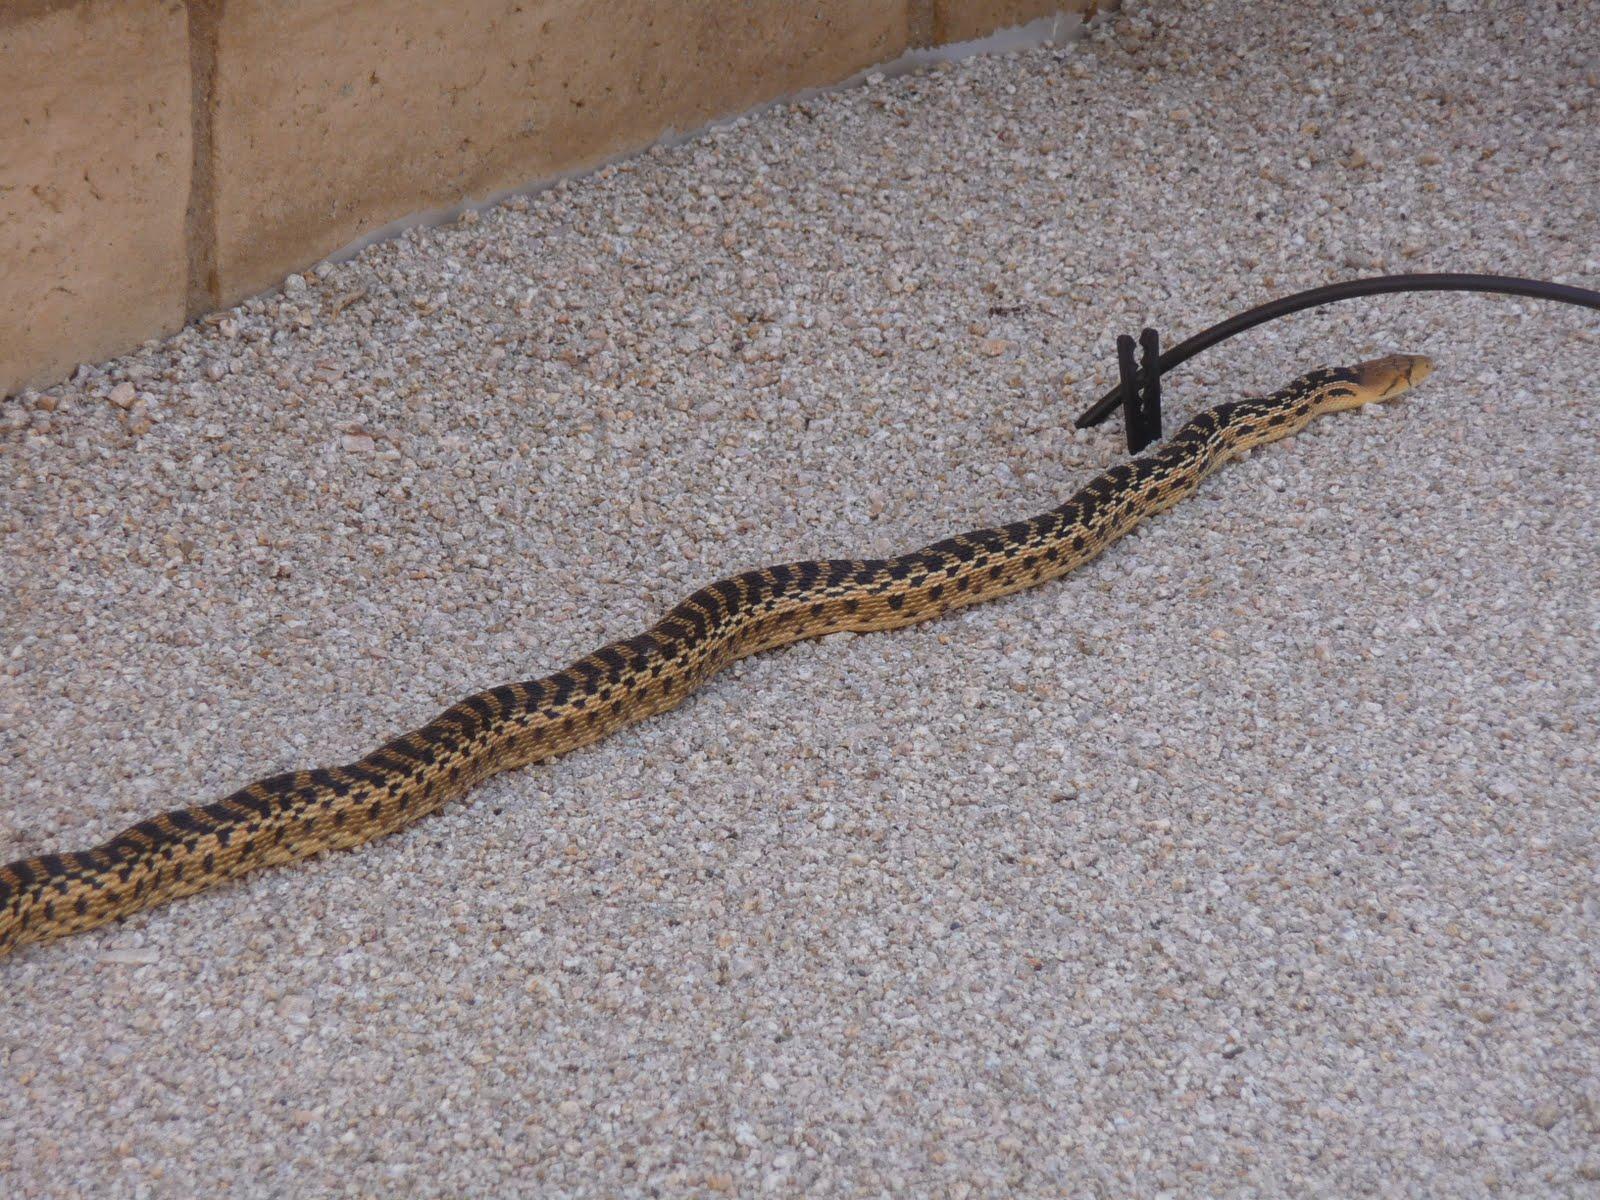 hikeminded snake in the back yard